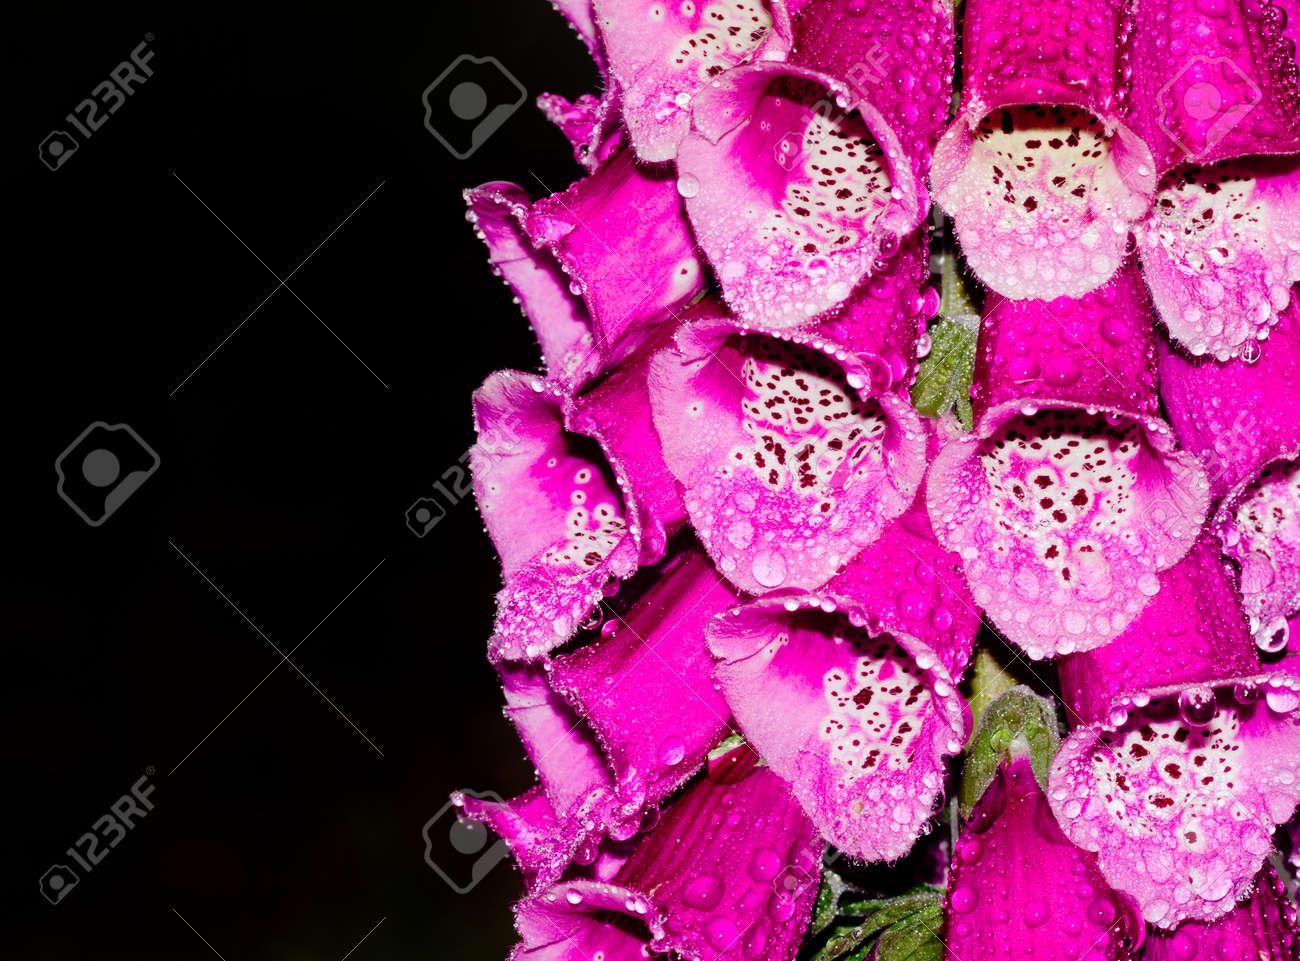 Close up of pink purple digitalis or foxglove flowers with water close up of pink purple digitalis or foxglove flowers with water drops on black background stock mightylinksfo